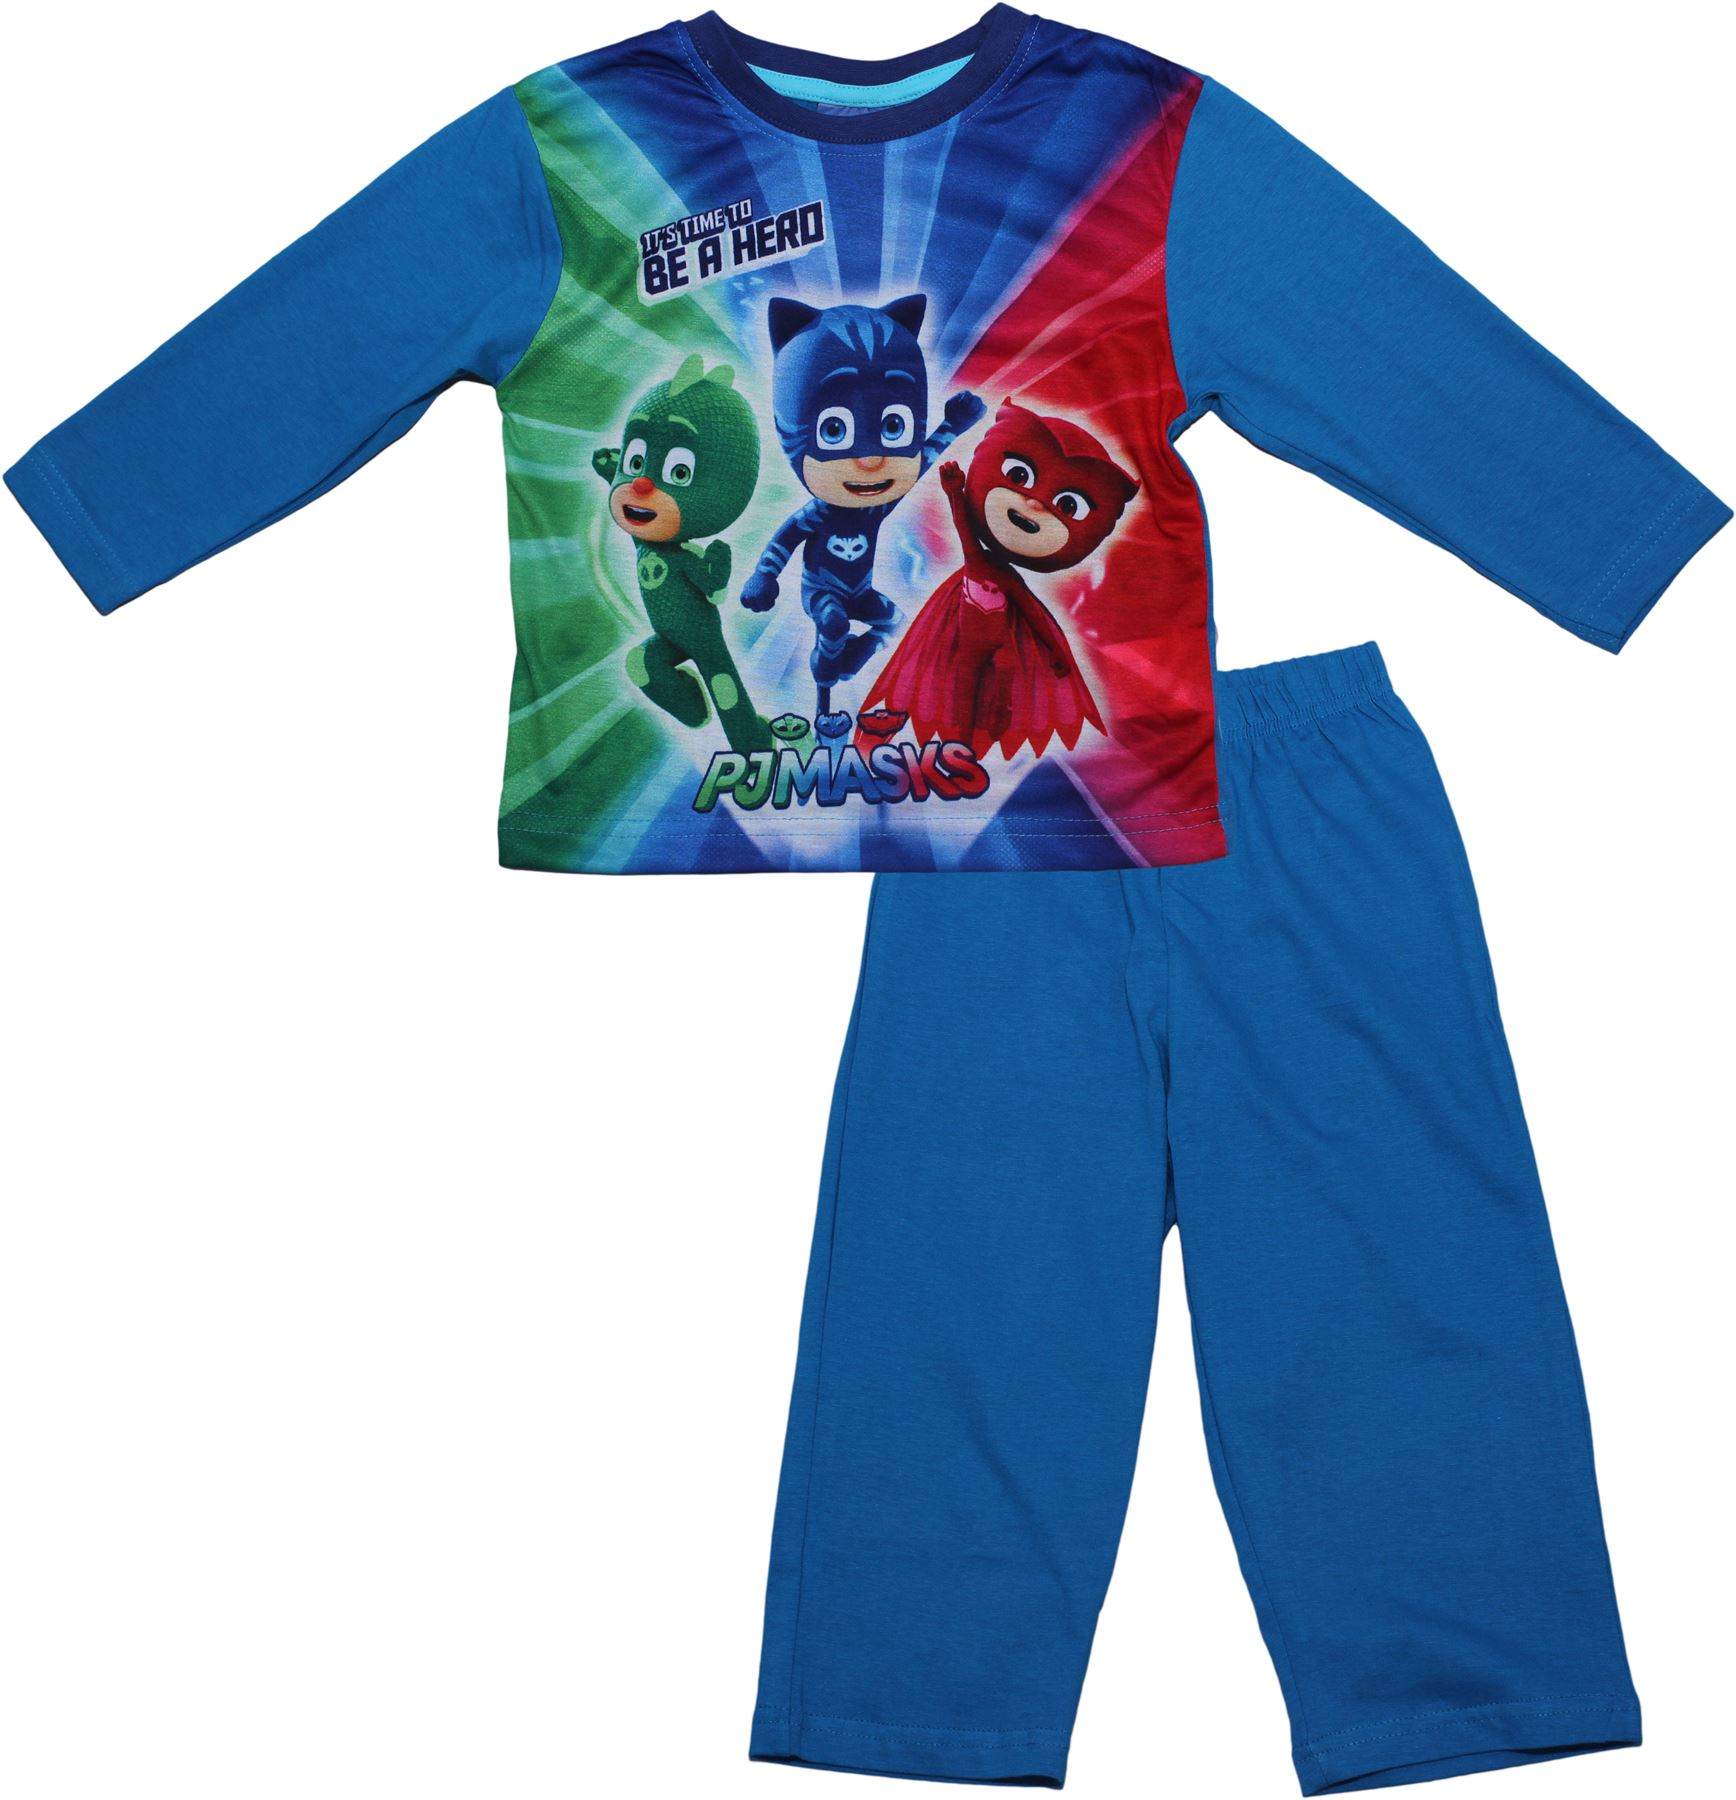 02191805 PJ Masks Children's Boys Time To Be A Hero Long Sleeve Pyjama Set New  2017-2018